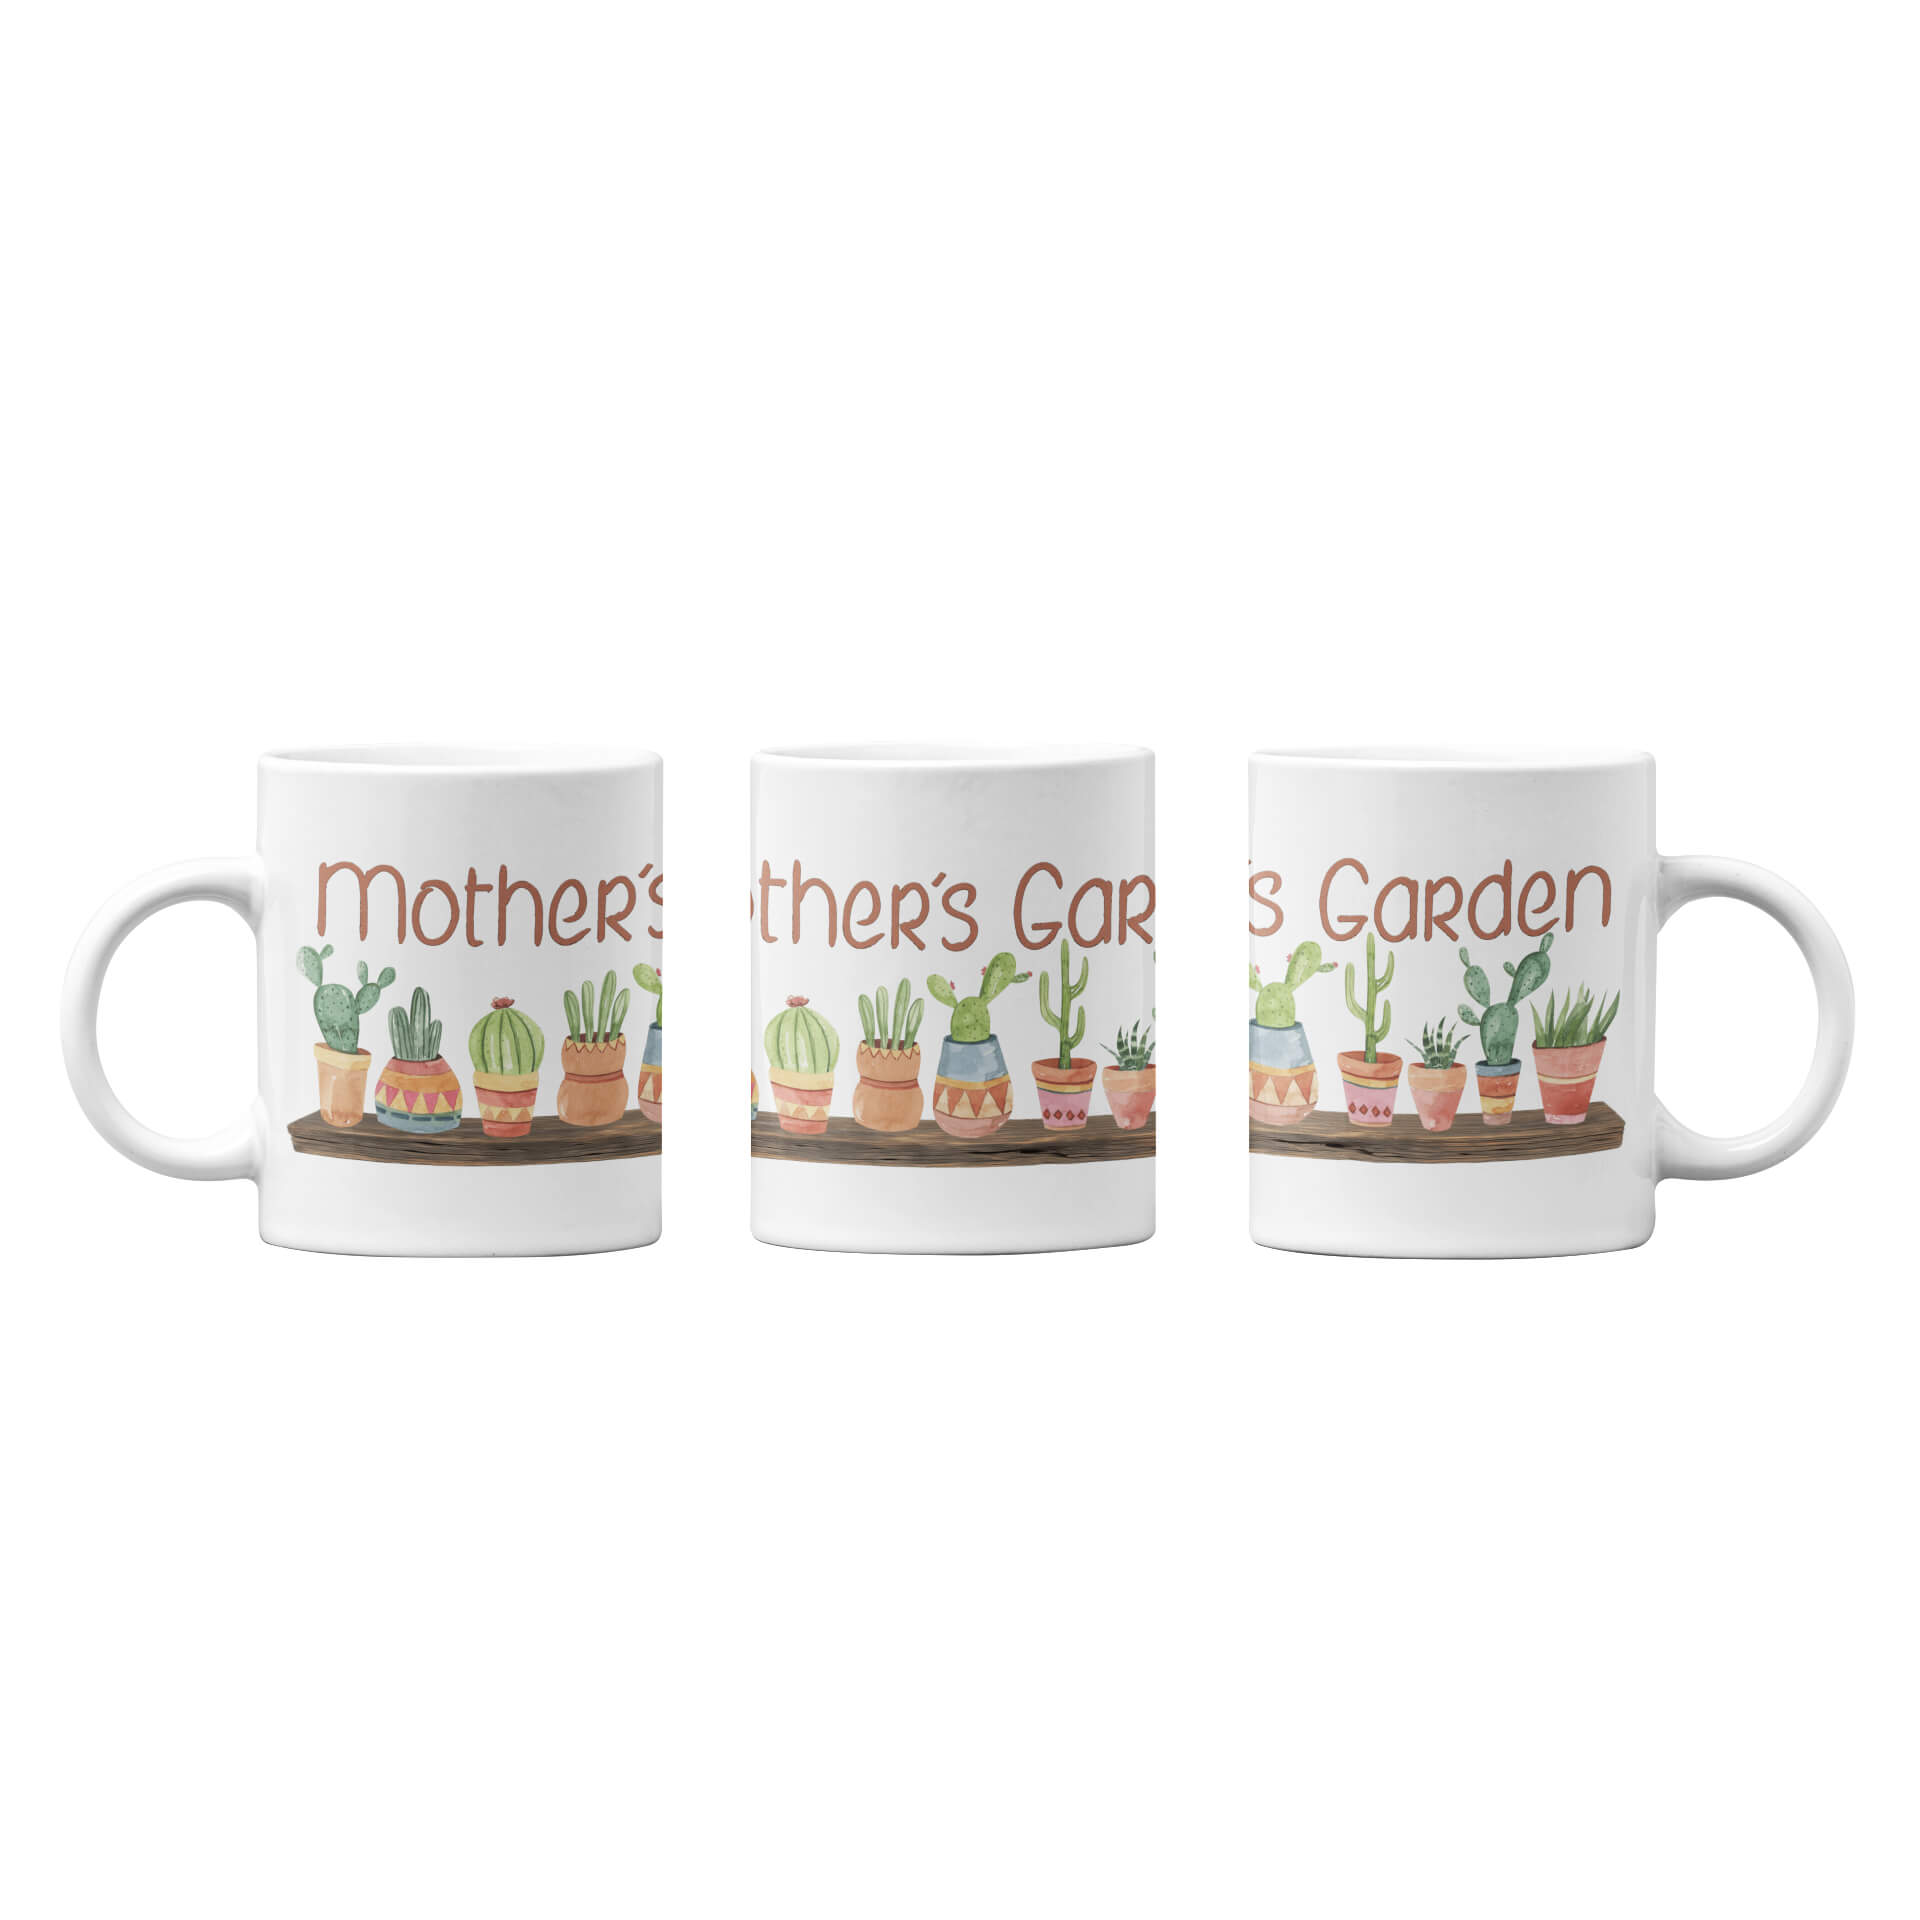 Mother's Garden Mug